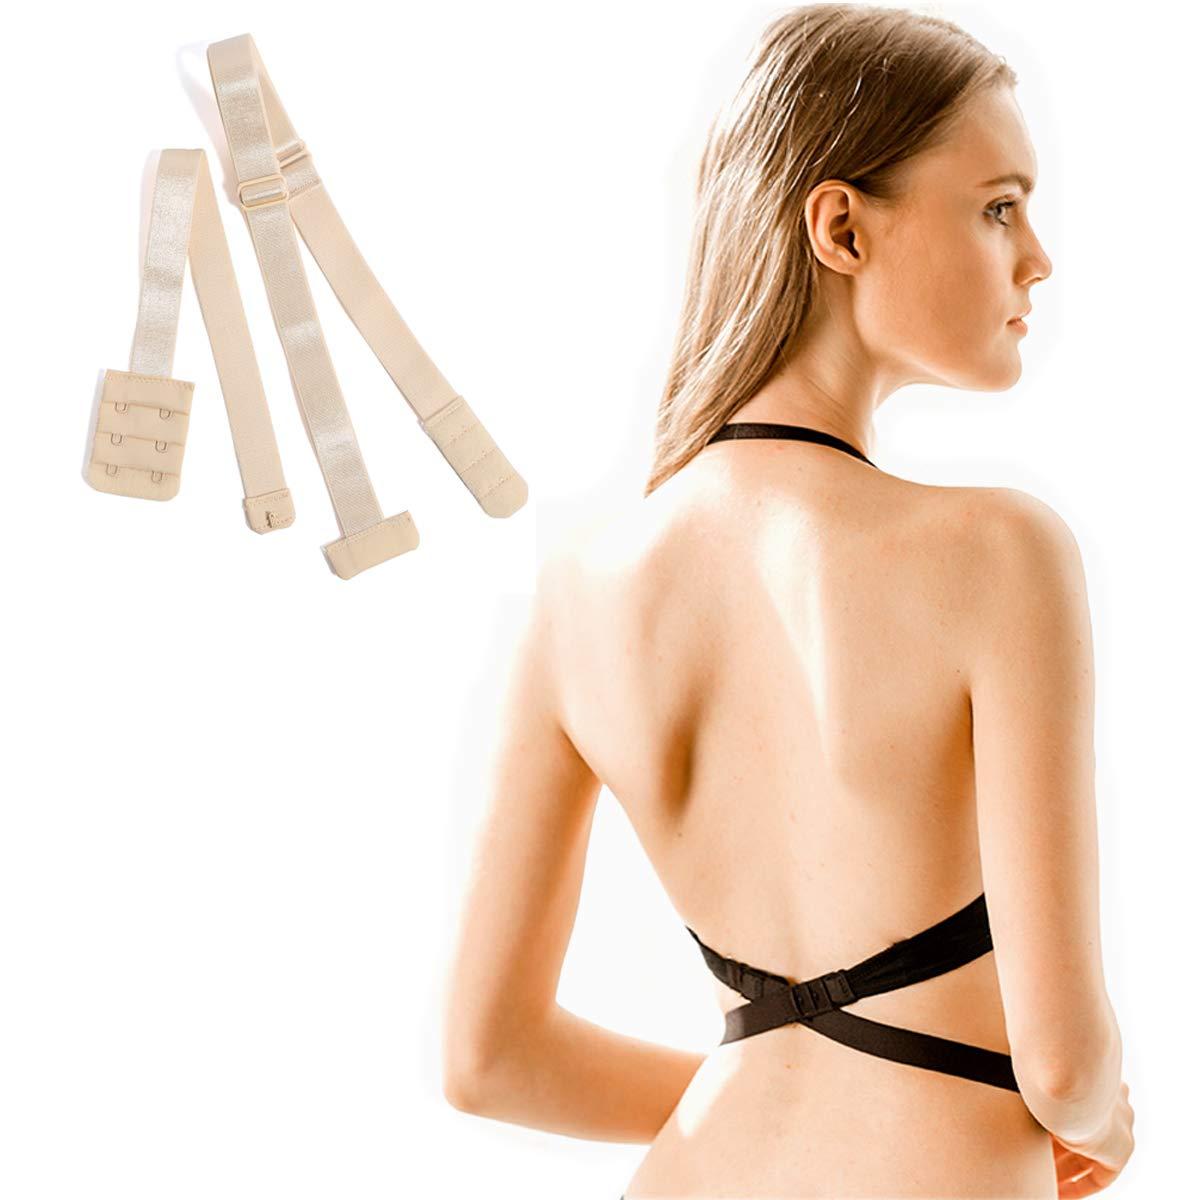 2c2832c17eec1 Bra Extender 2 Hook Low Back Bra Strap Converter for Women Lady Backless  Dress at Amazon Women s Clothing store